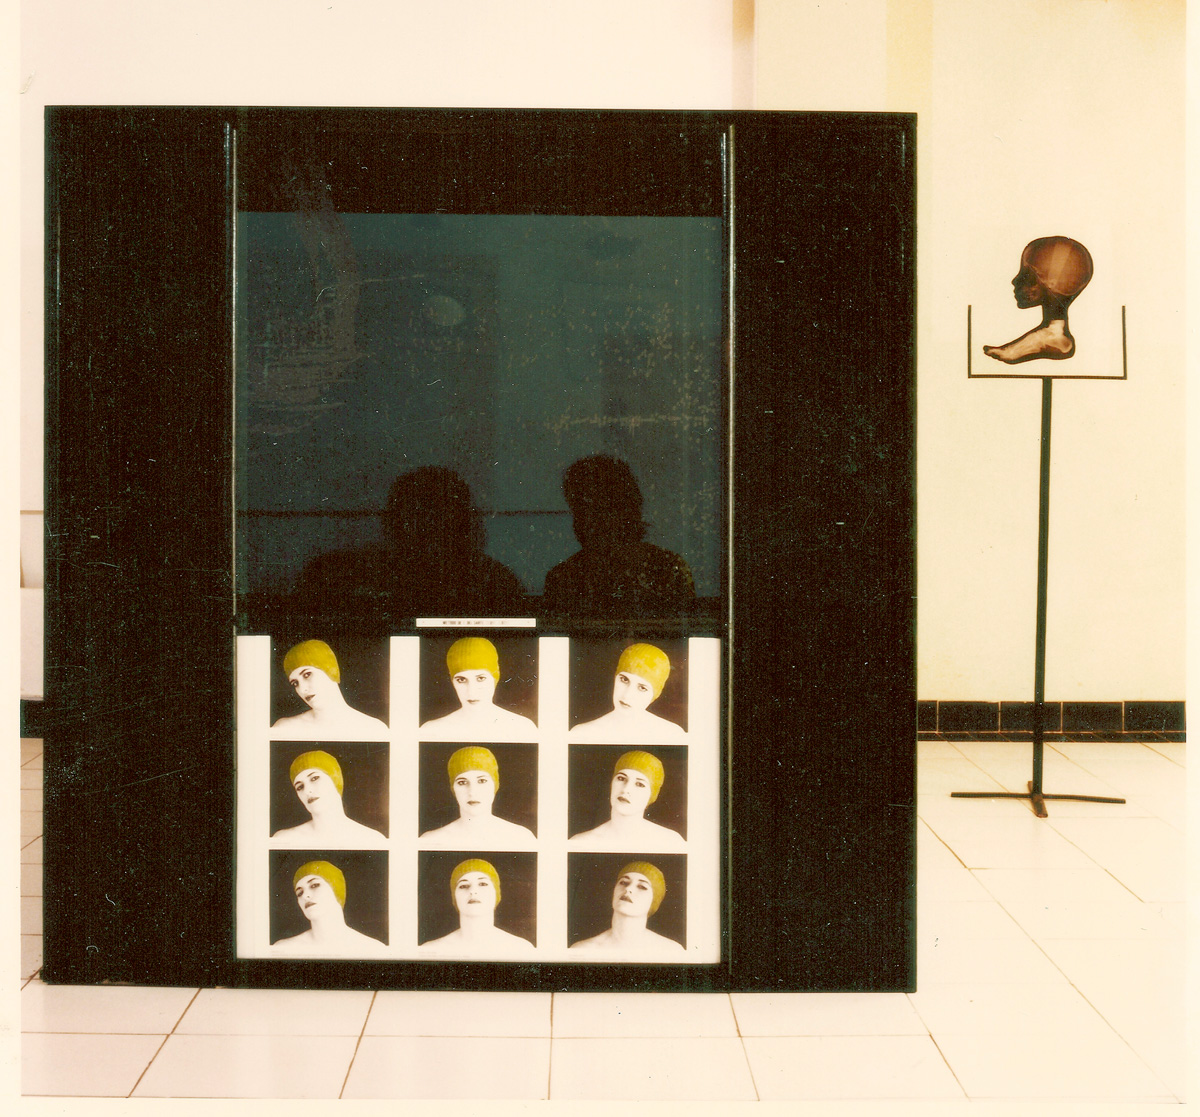 Invernadero. Topos. Nela Ochoa. 1987.